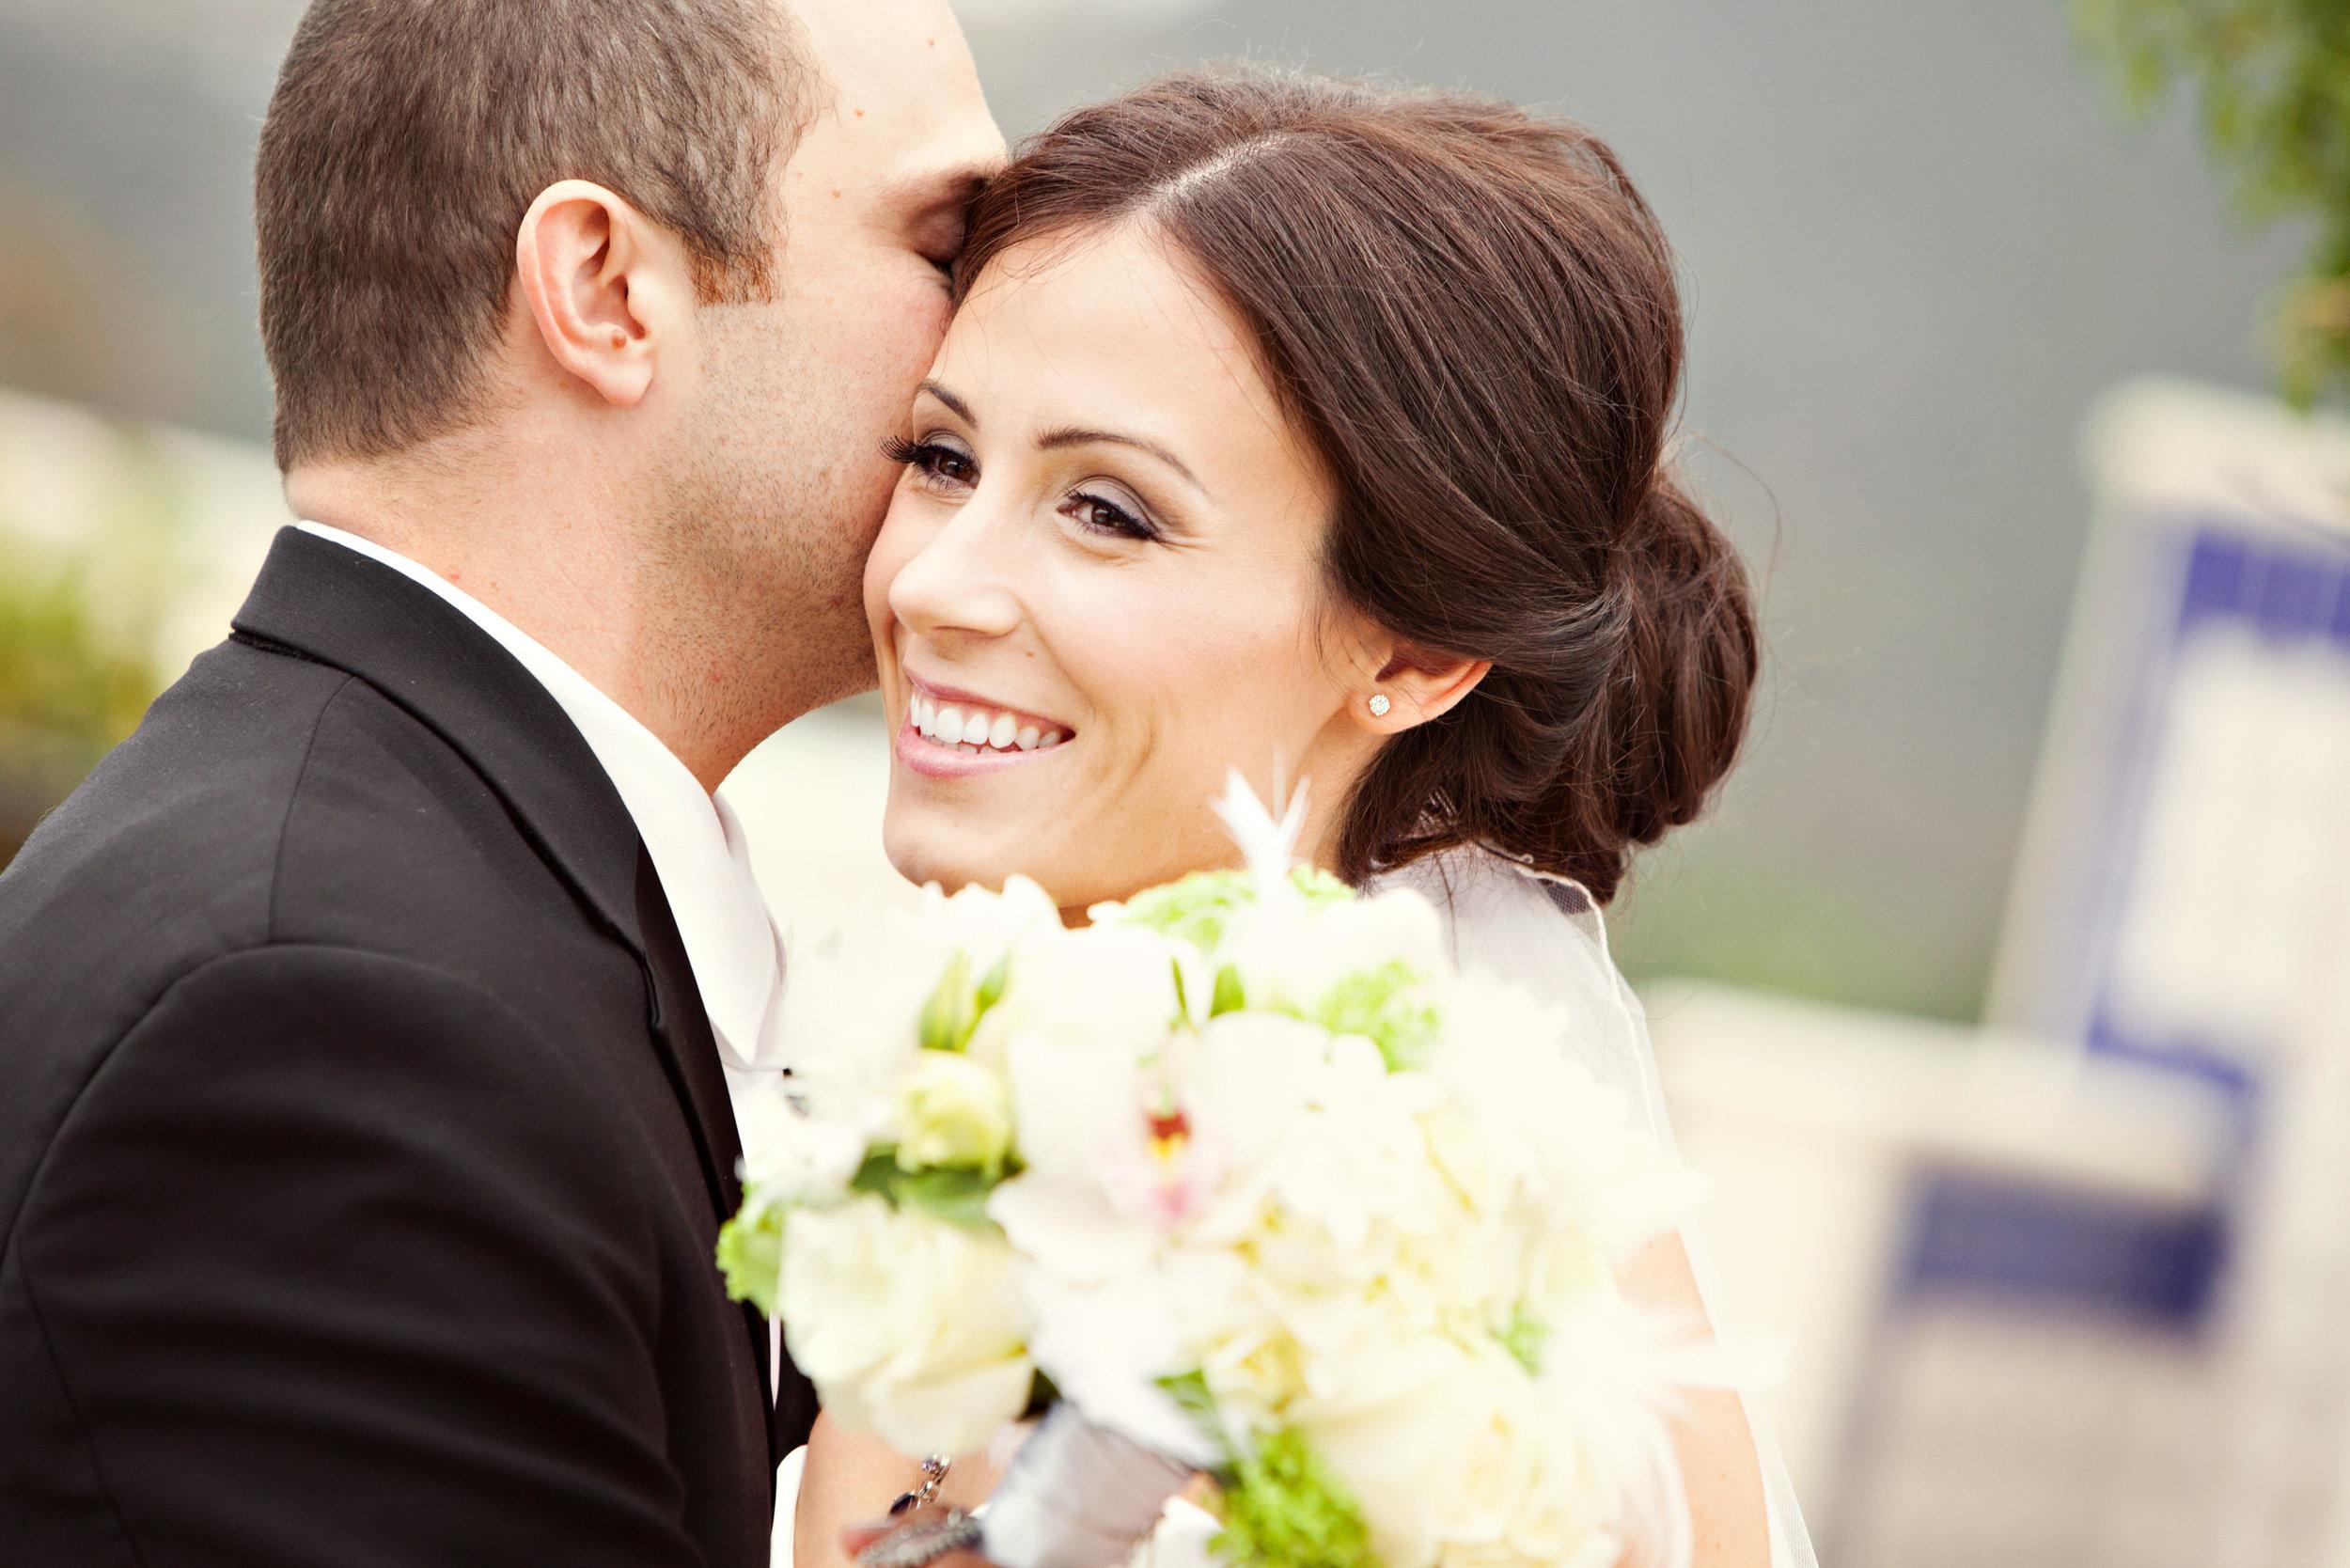 andrejka photography santa barbara wedding planning guide